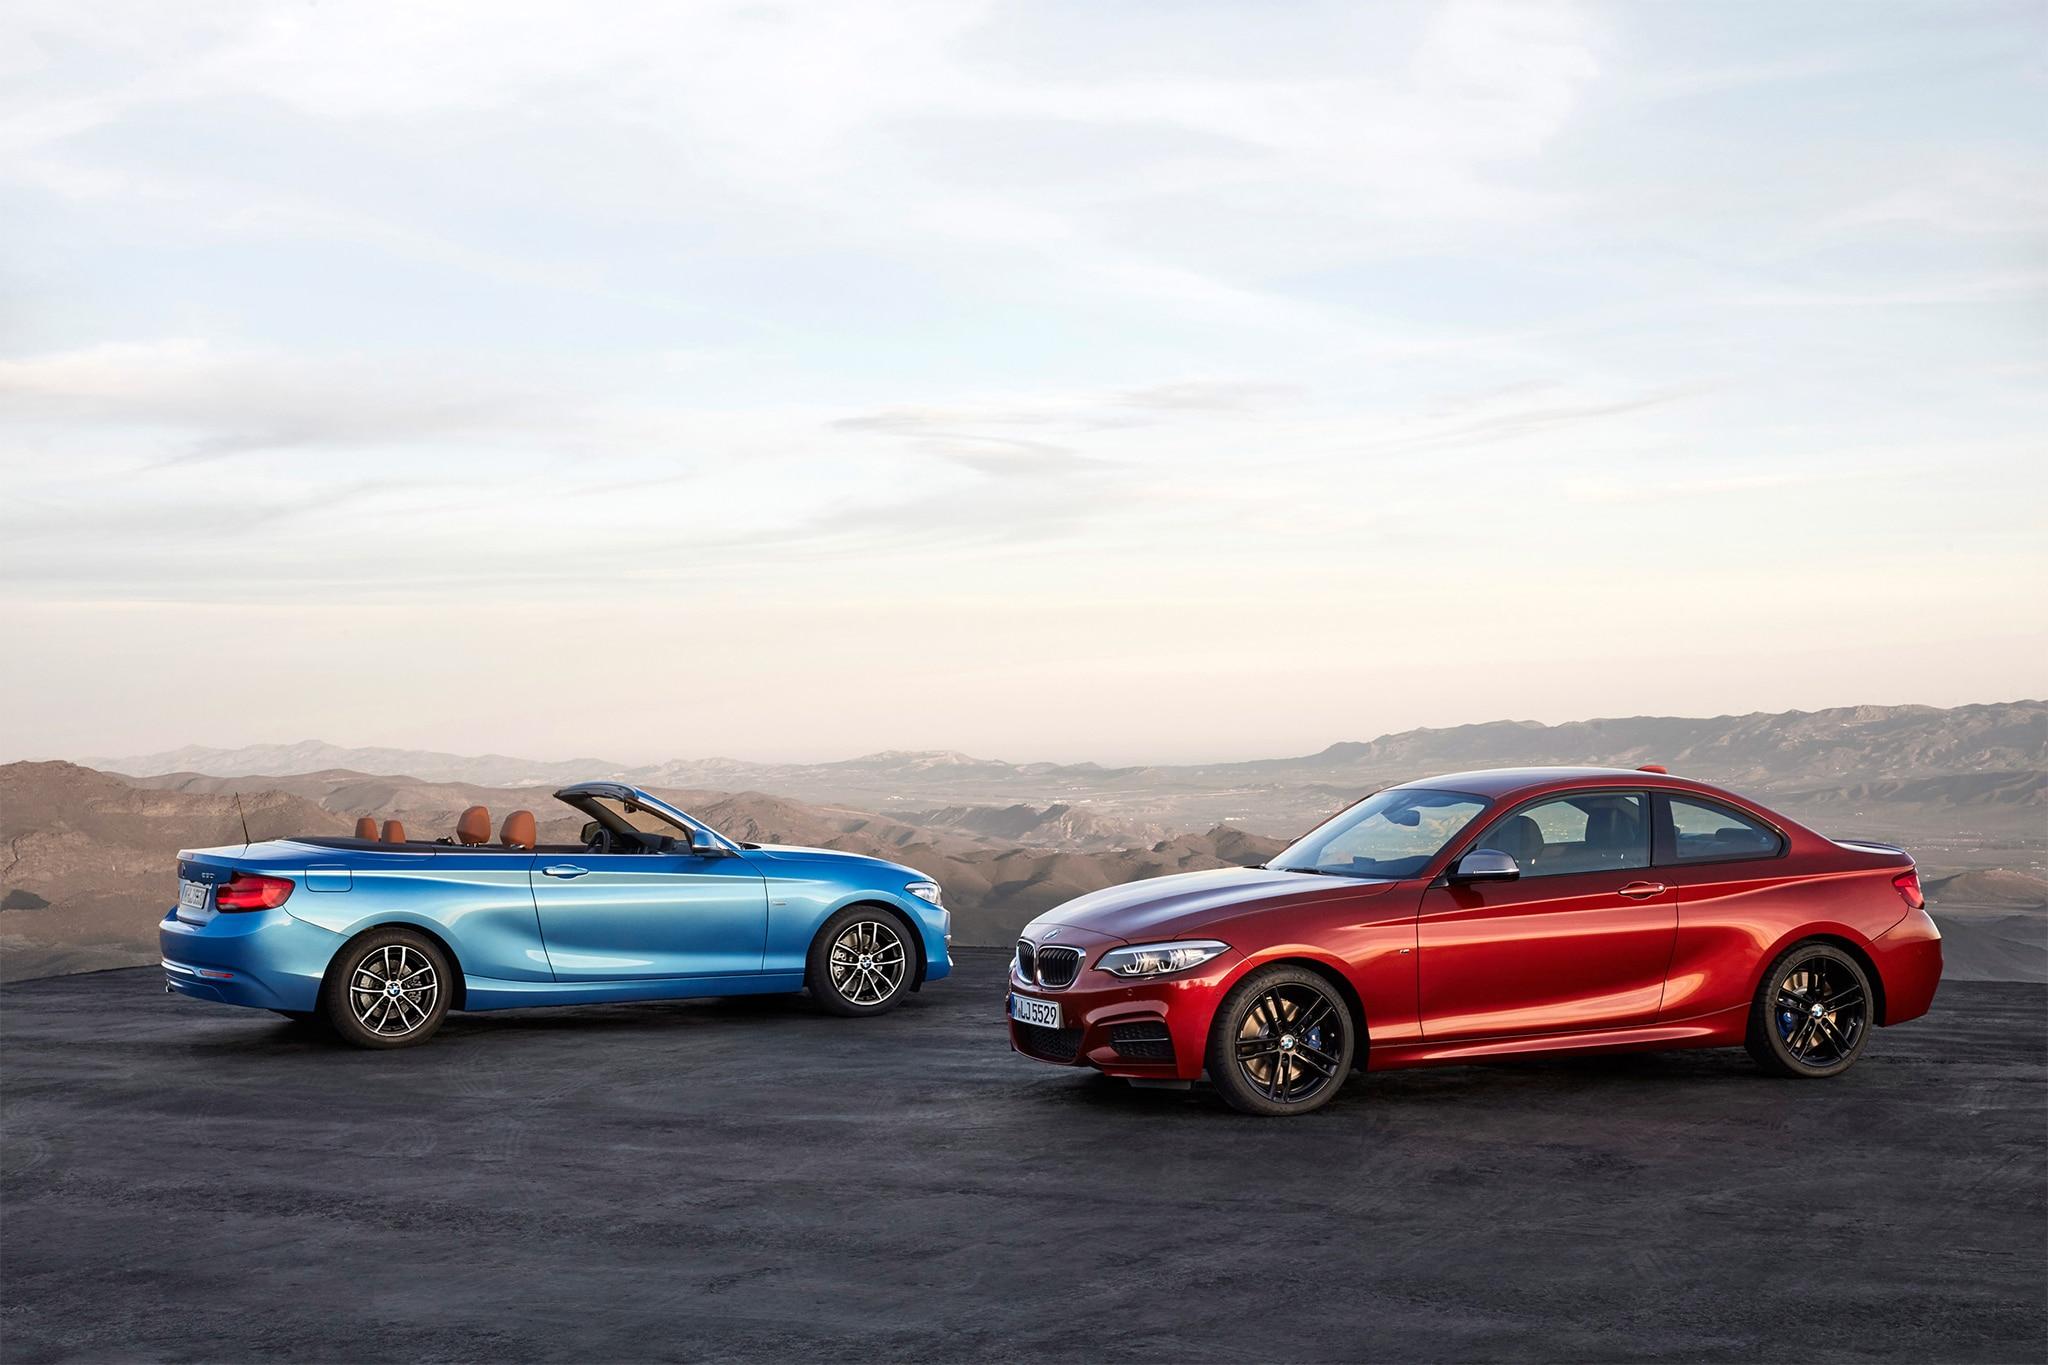 2018 Bmw 2 Series Arrives With Subtle Updates Automobile